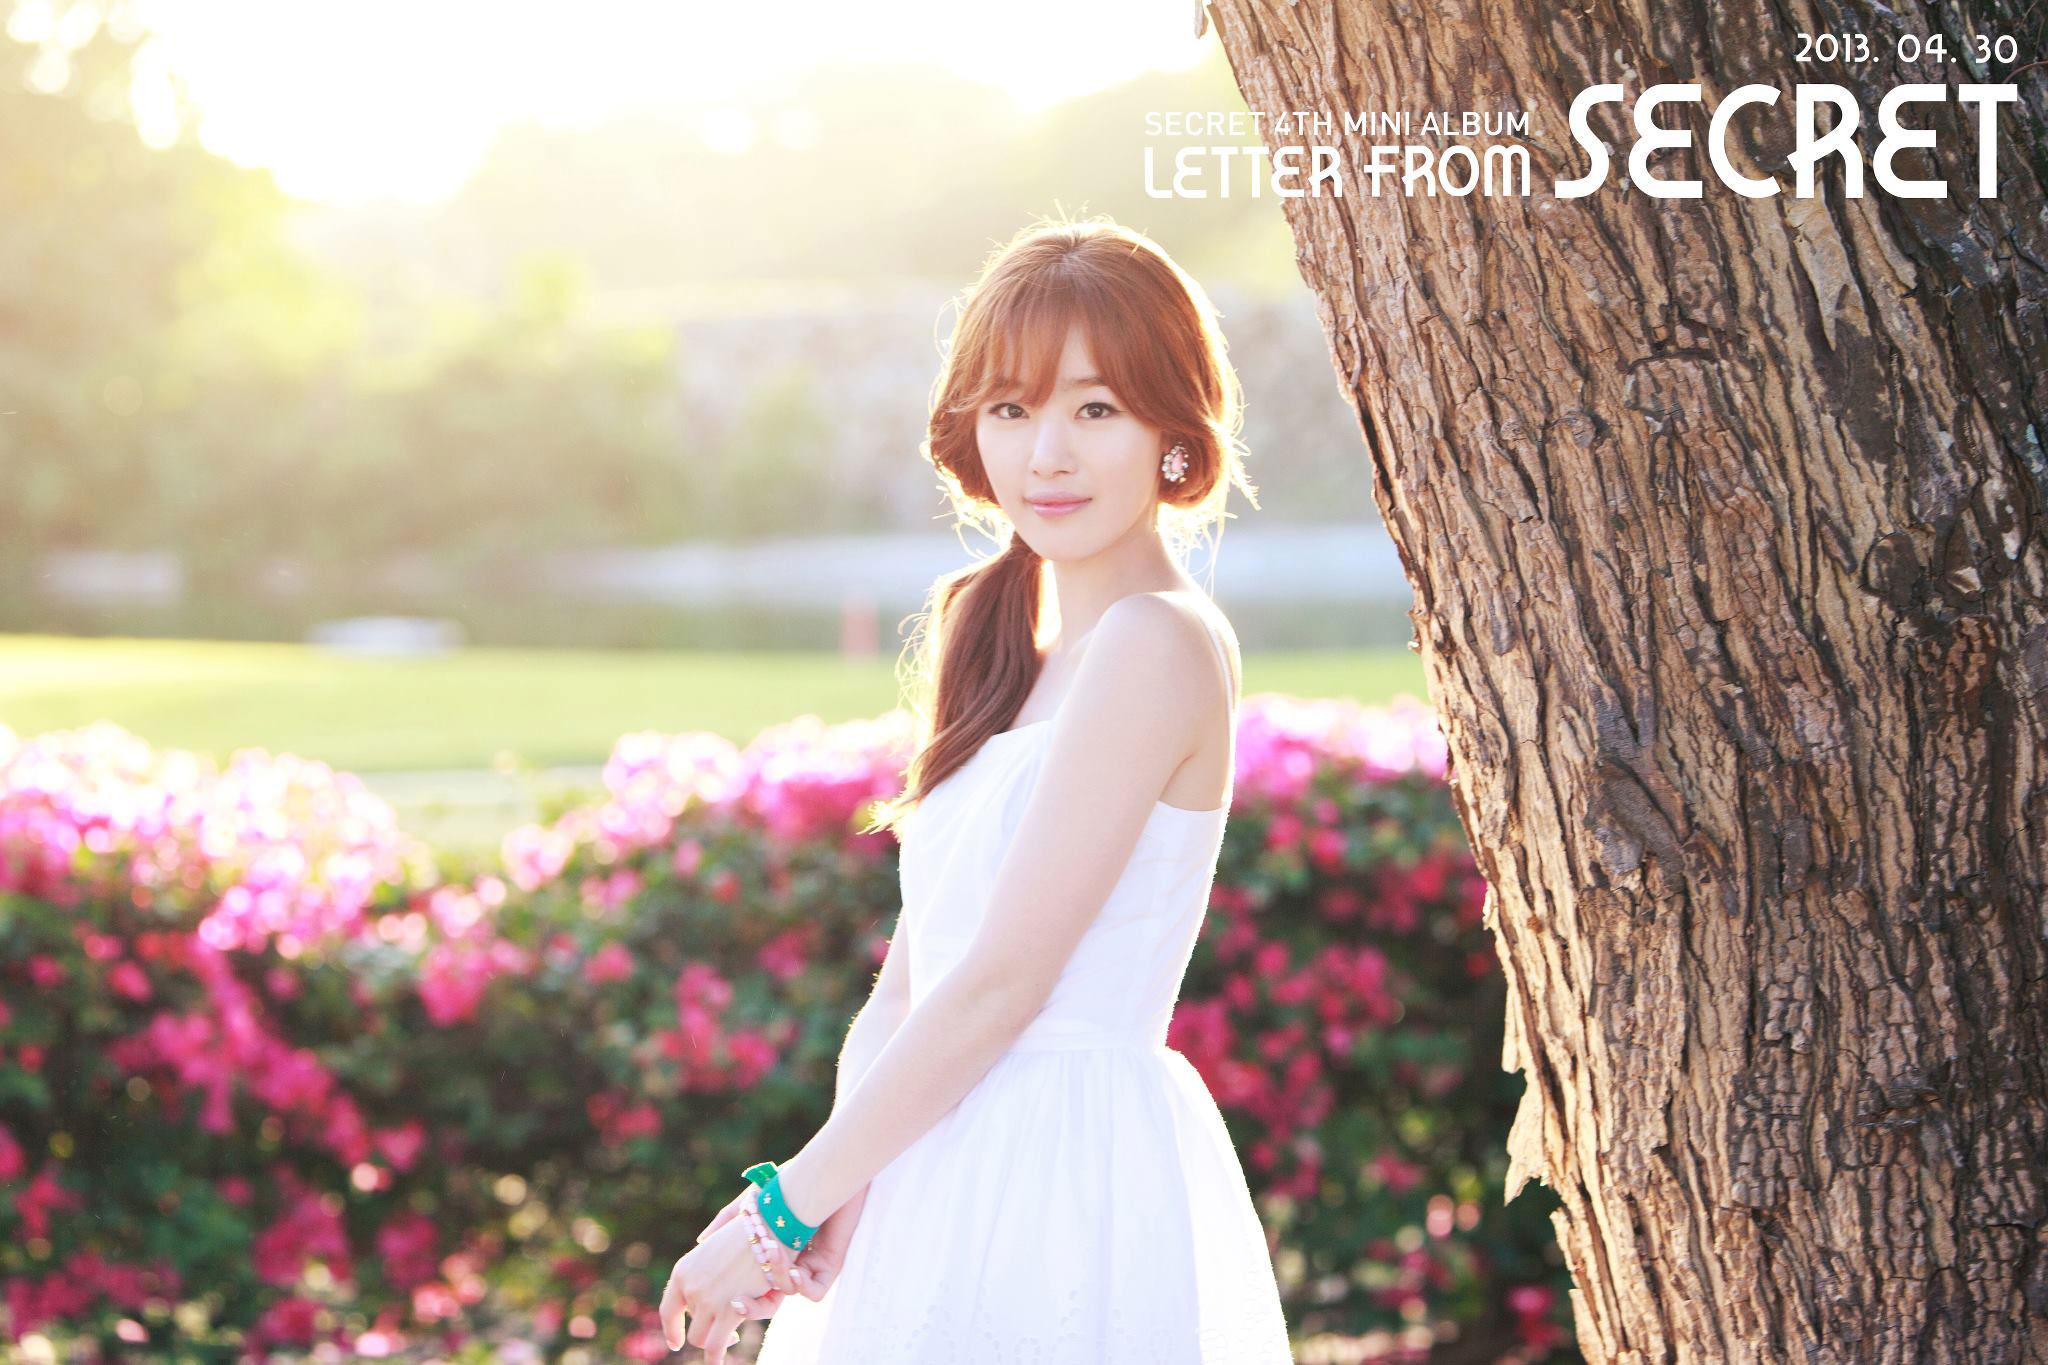 Secret Sunhwa Letter album